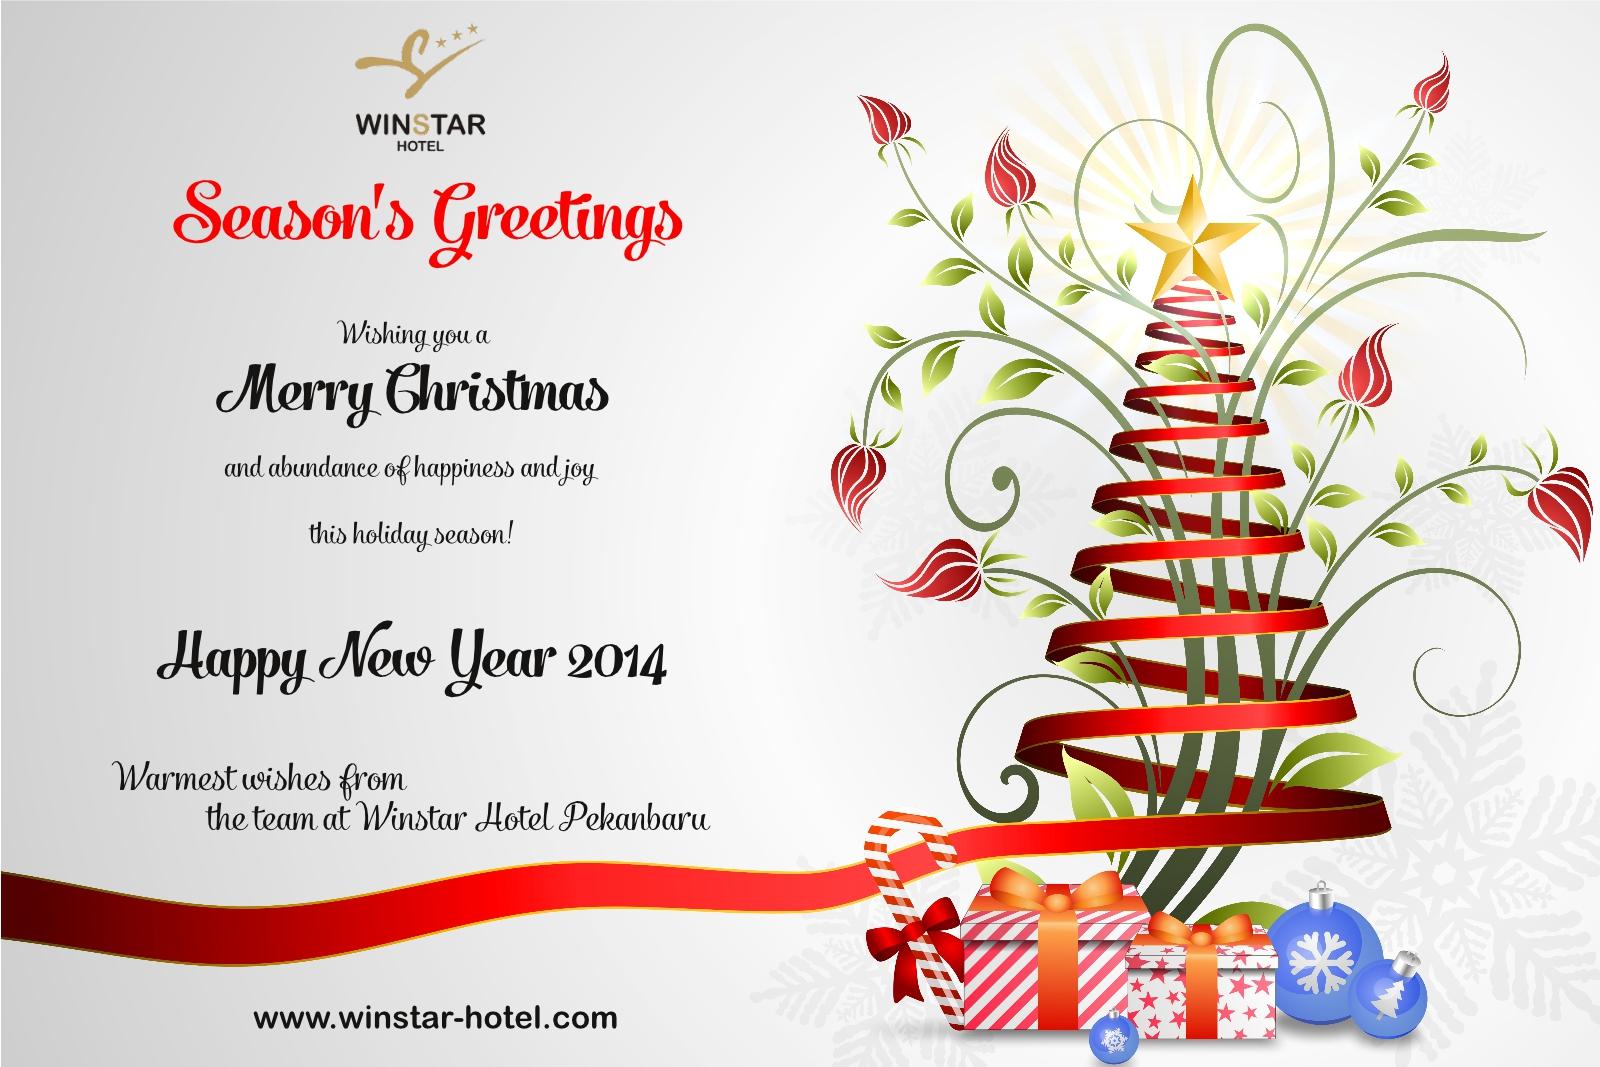 Seasons Greetings From Winstar Hotel Pekanbaru Winstar Hotel